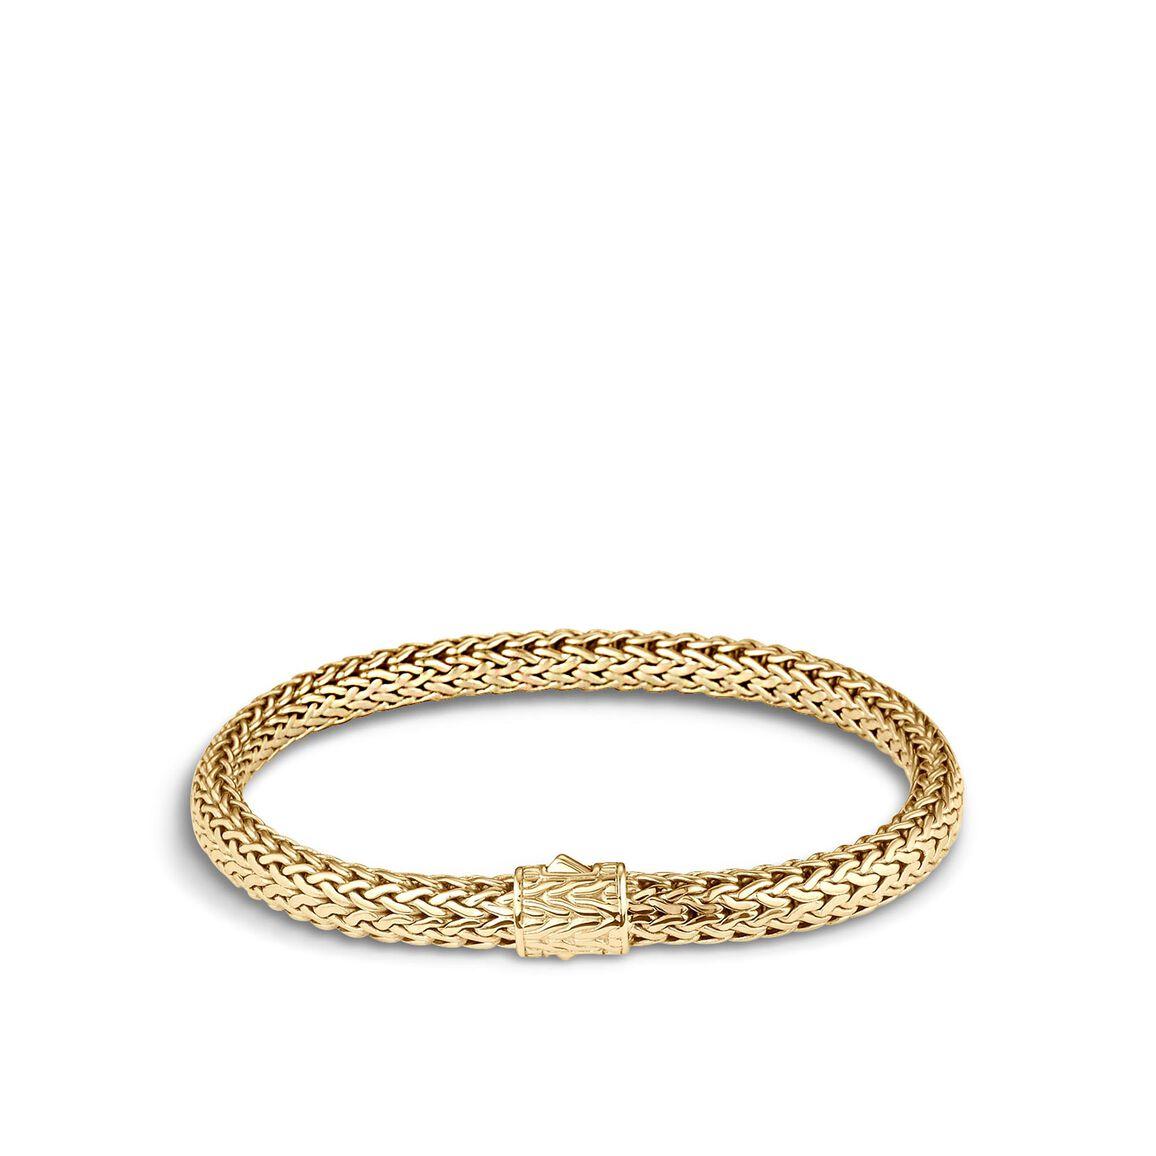 Classic Chain 6.5MM Bracelet in 18K Gold